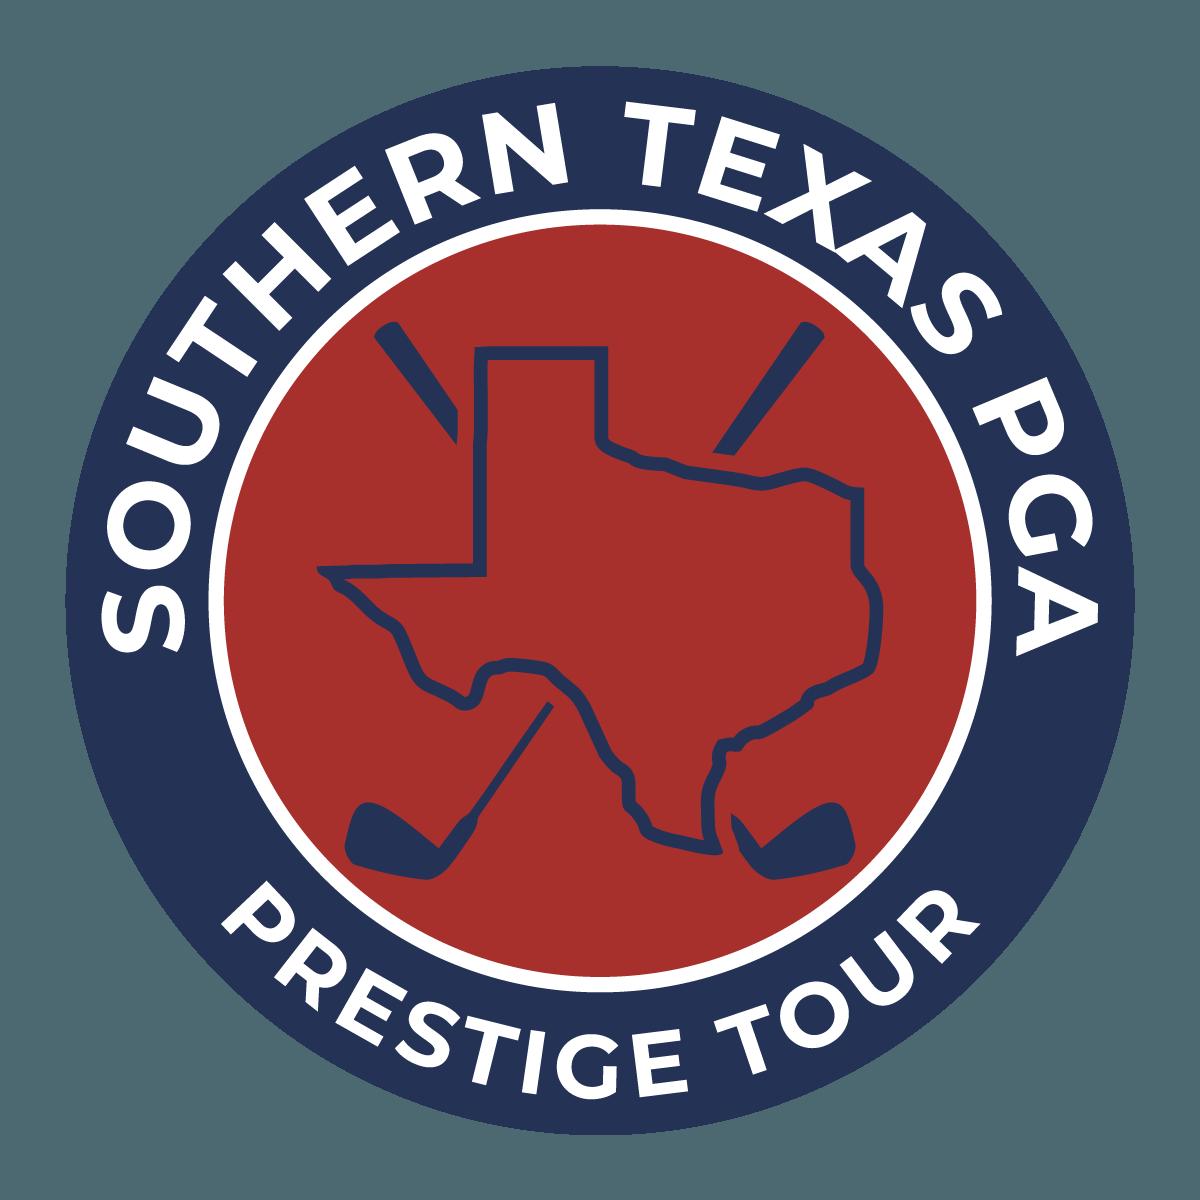 Prestige Tour Tournaments Programs Stpga Junior Golf